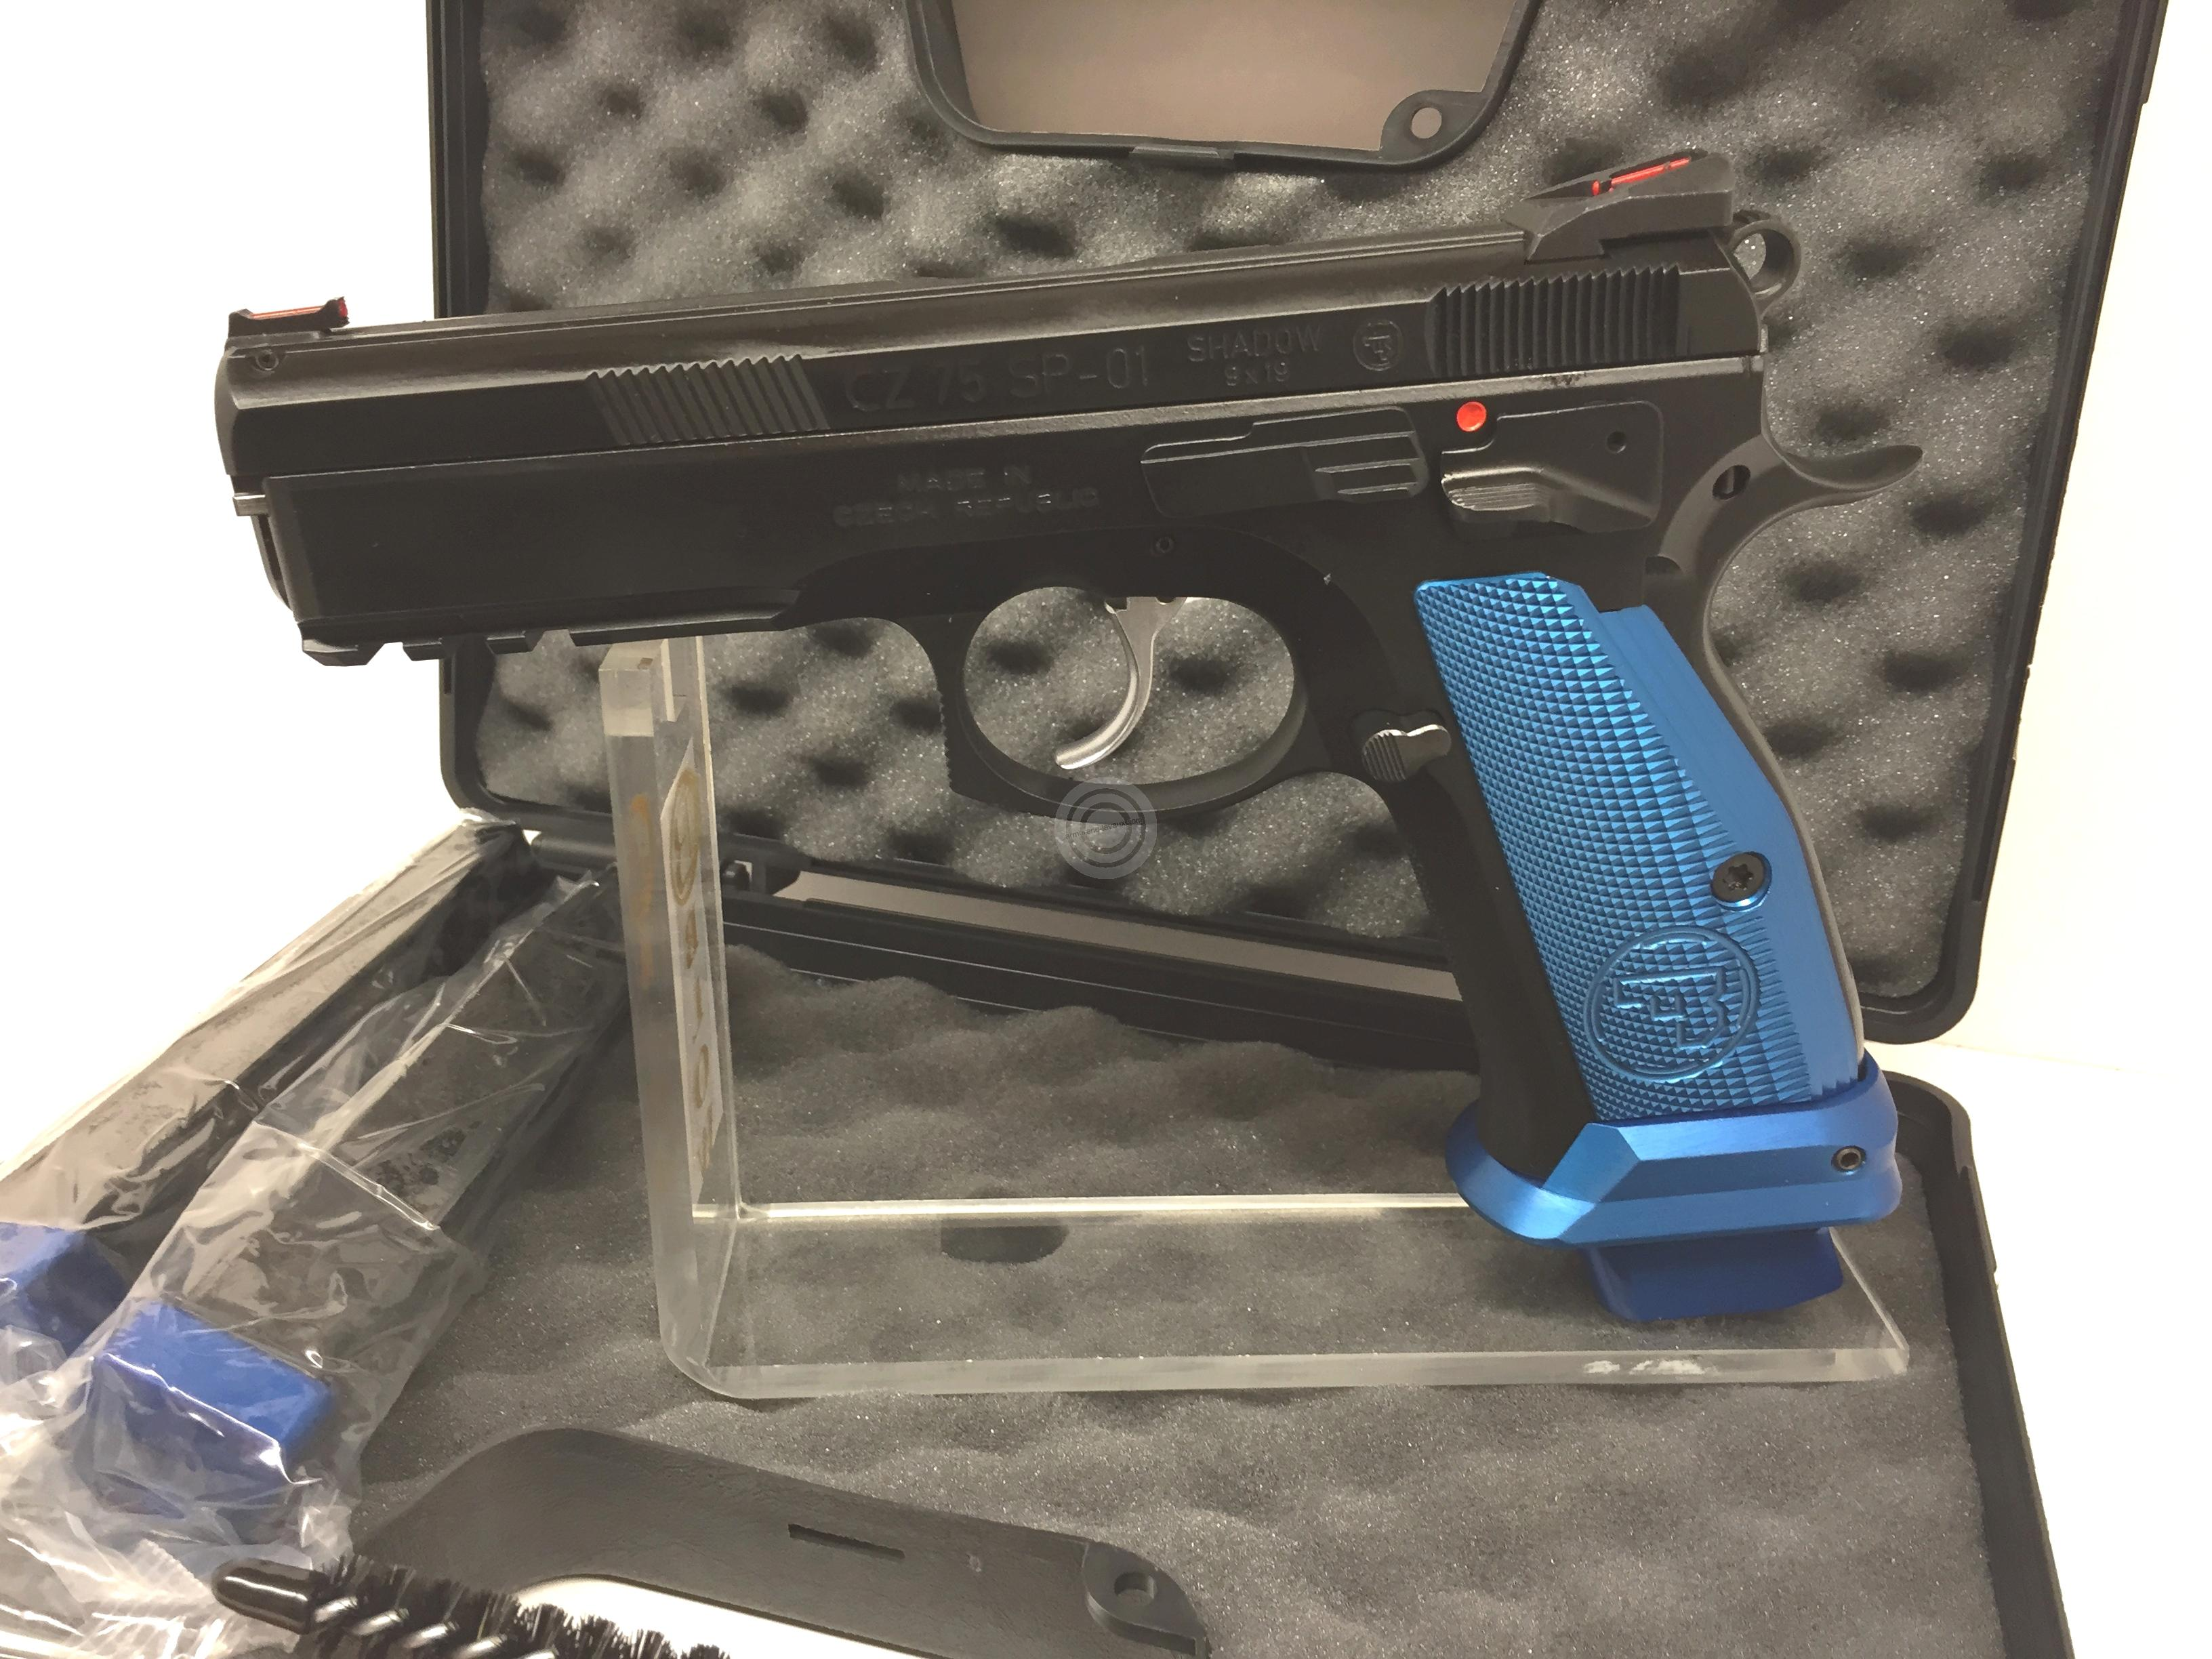 Pistolet CZ 75 SP01 Shadow French Mamba Bleu calibre 9x19